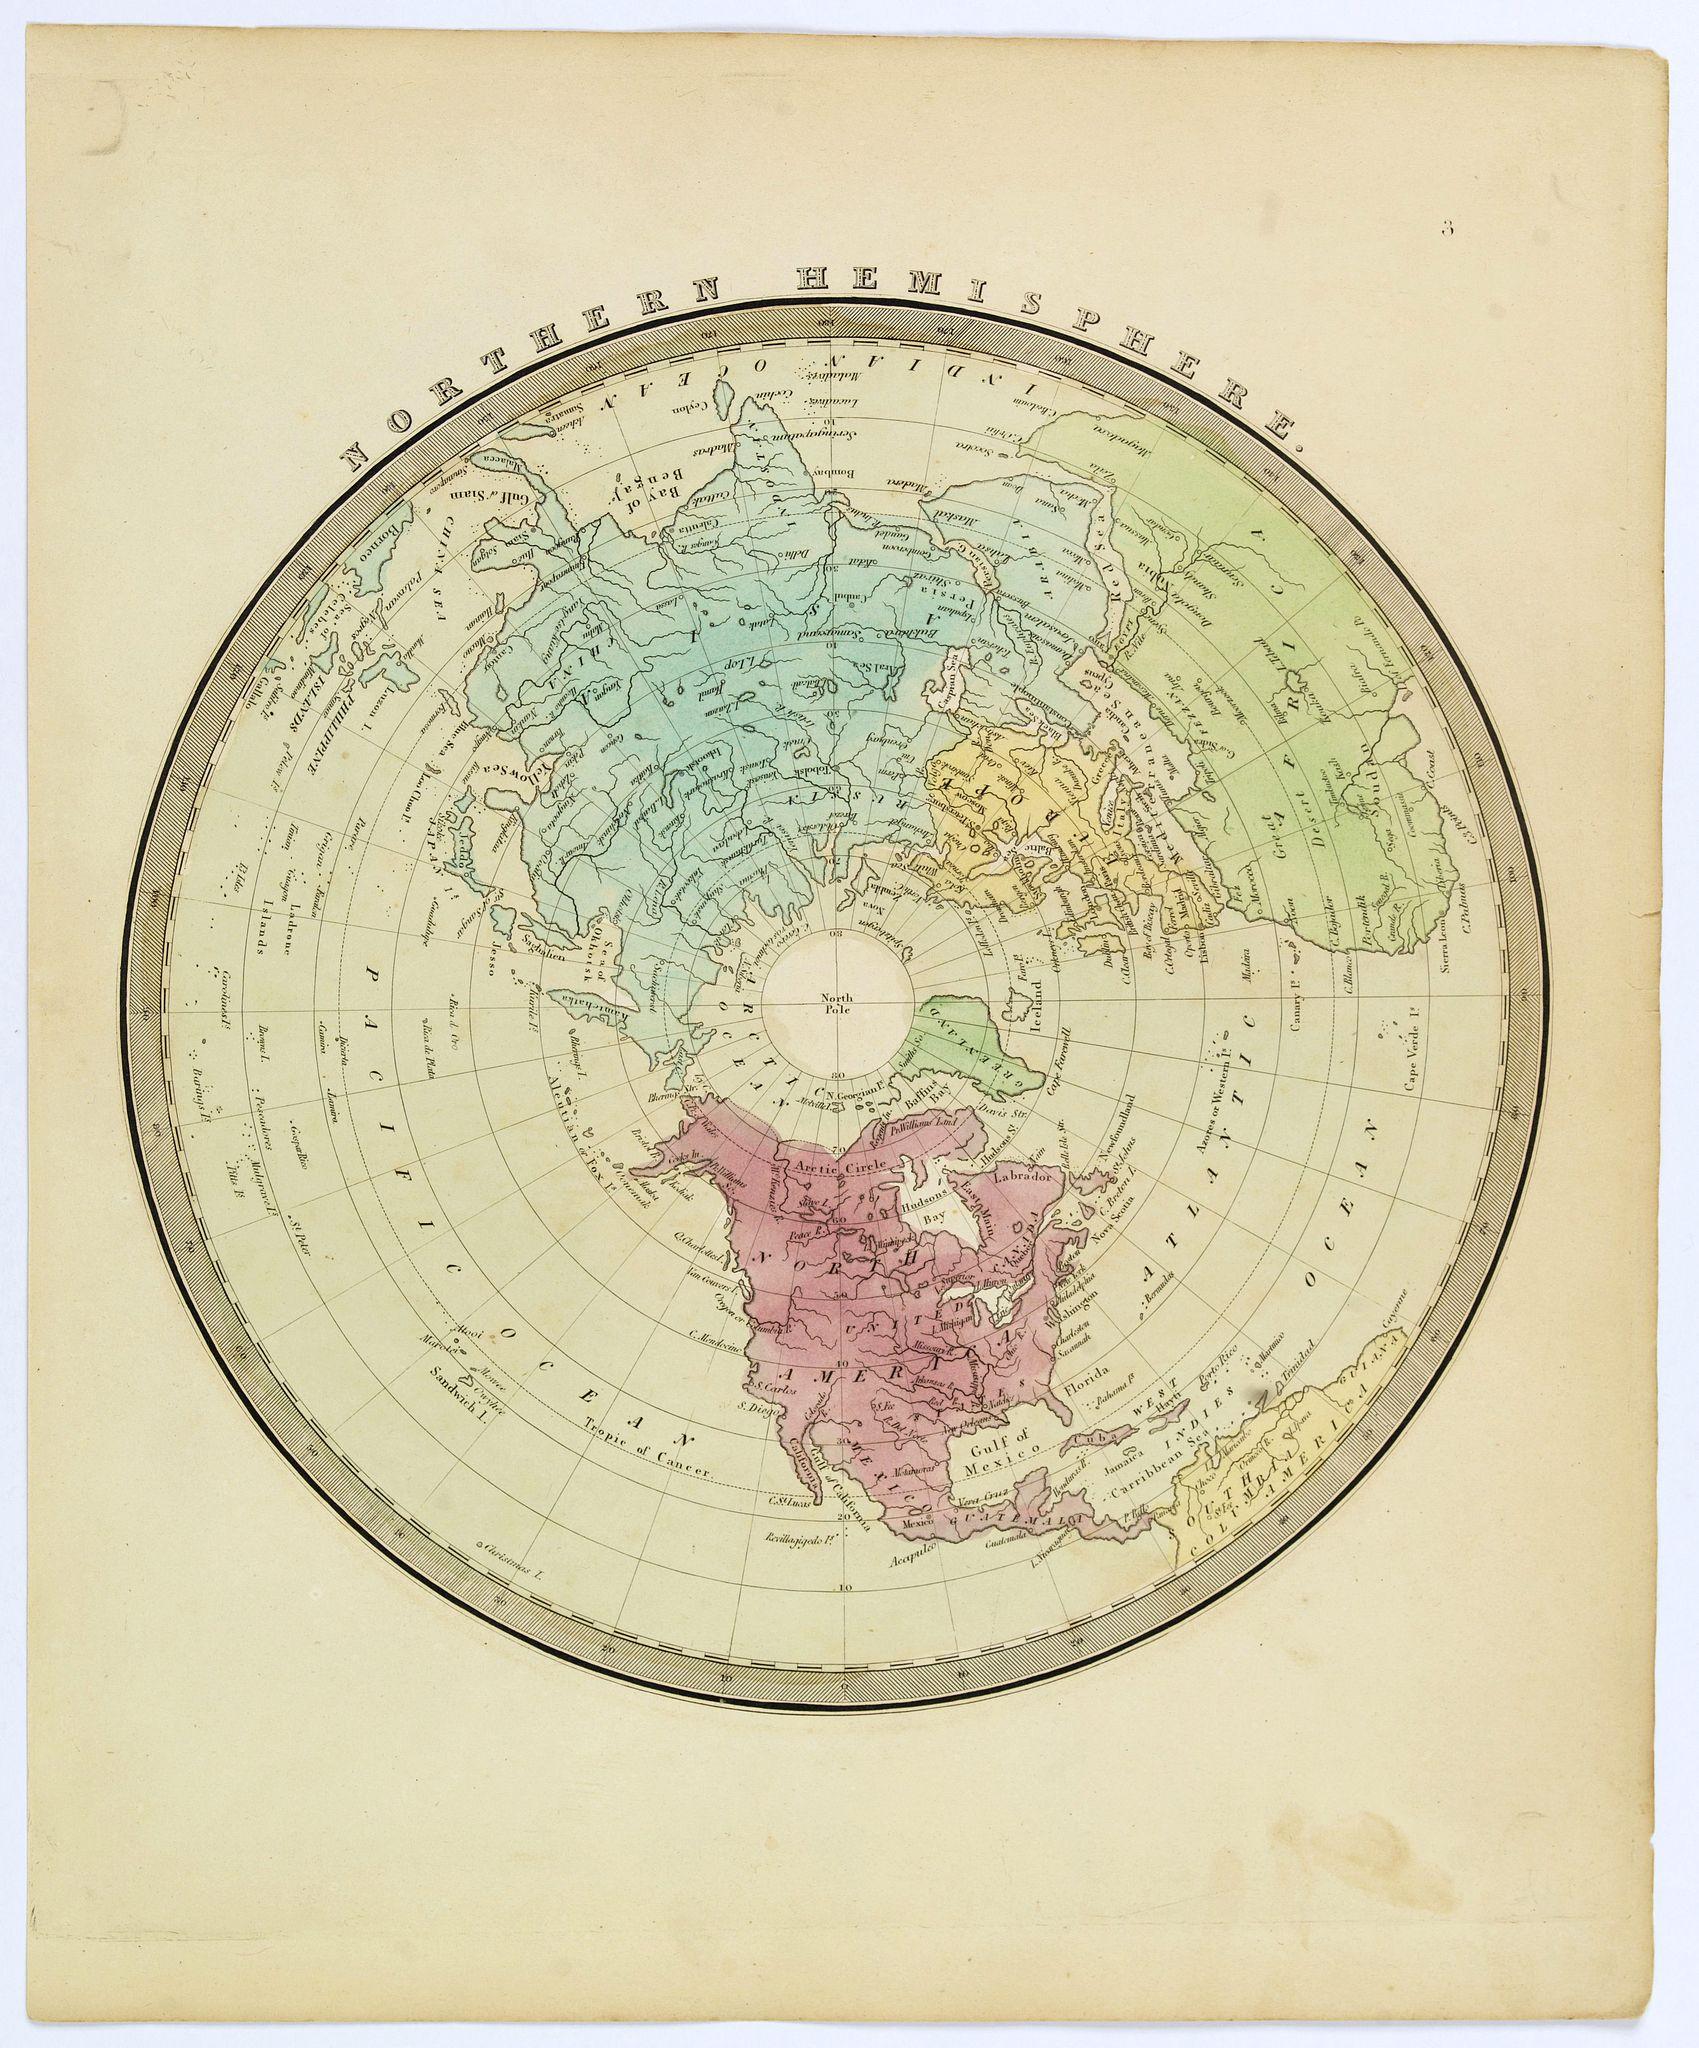 BURR, David. - Northern Hemisphere.